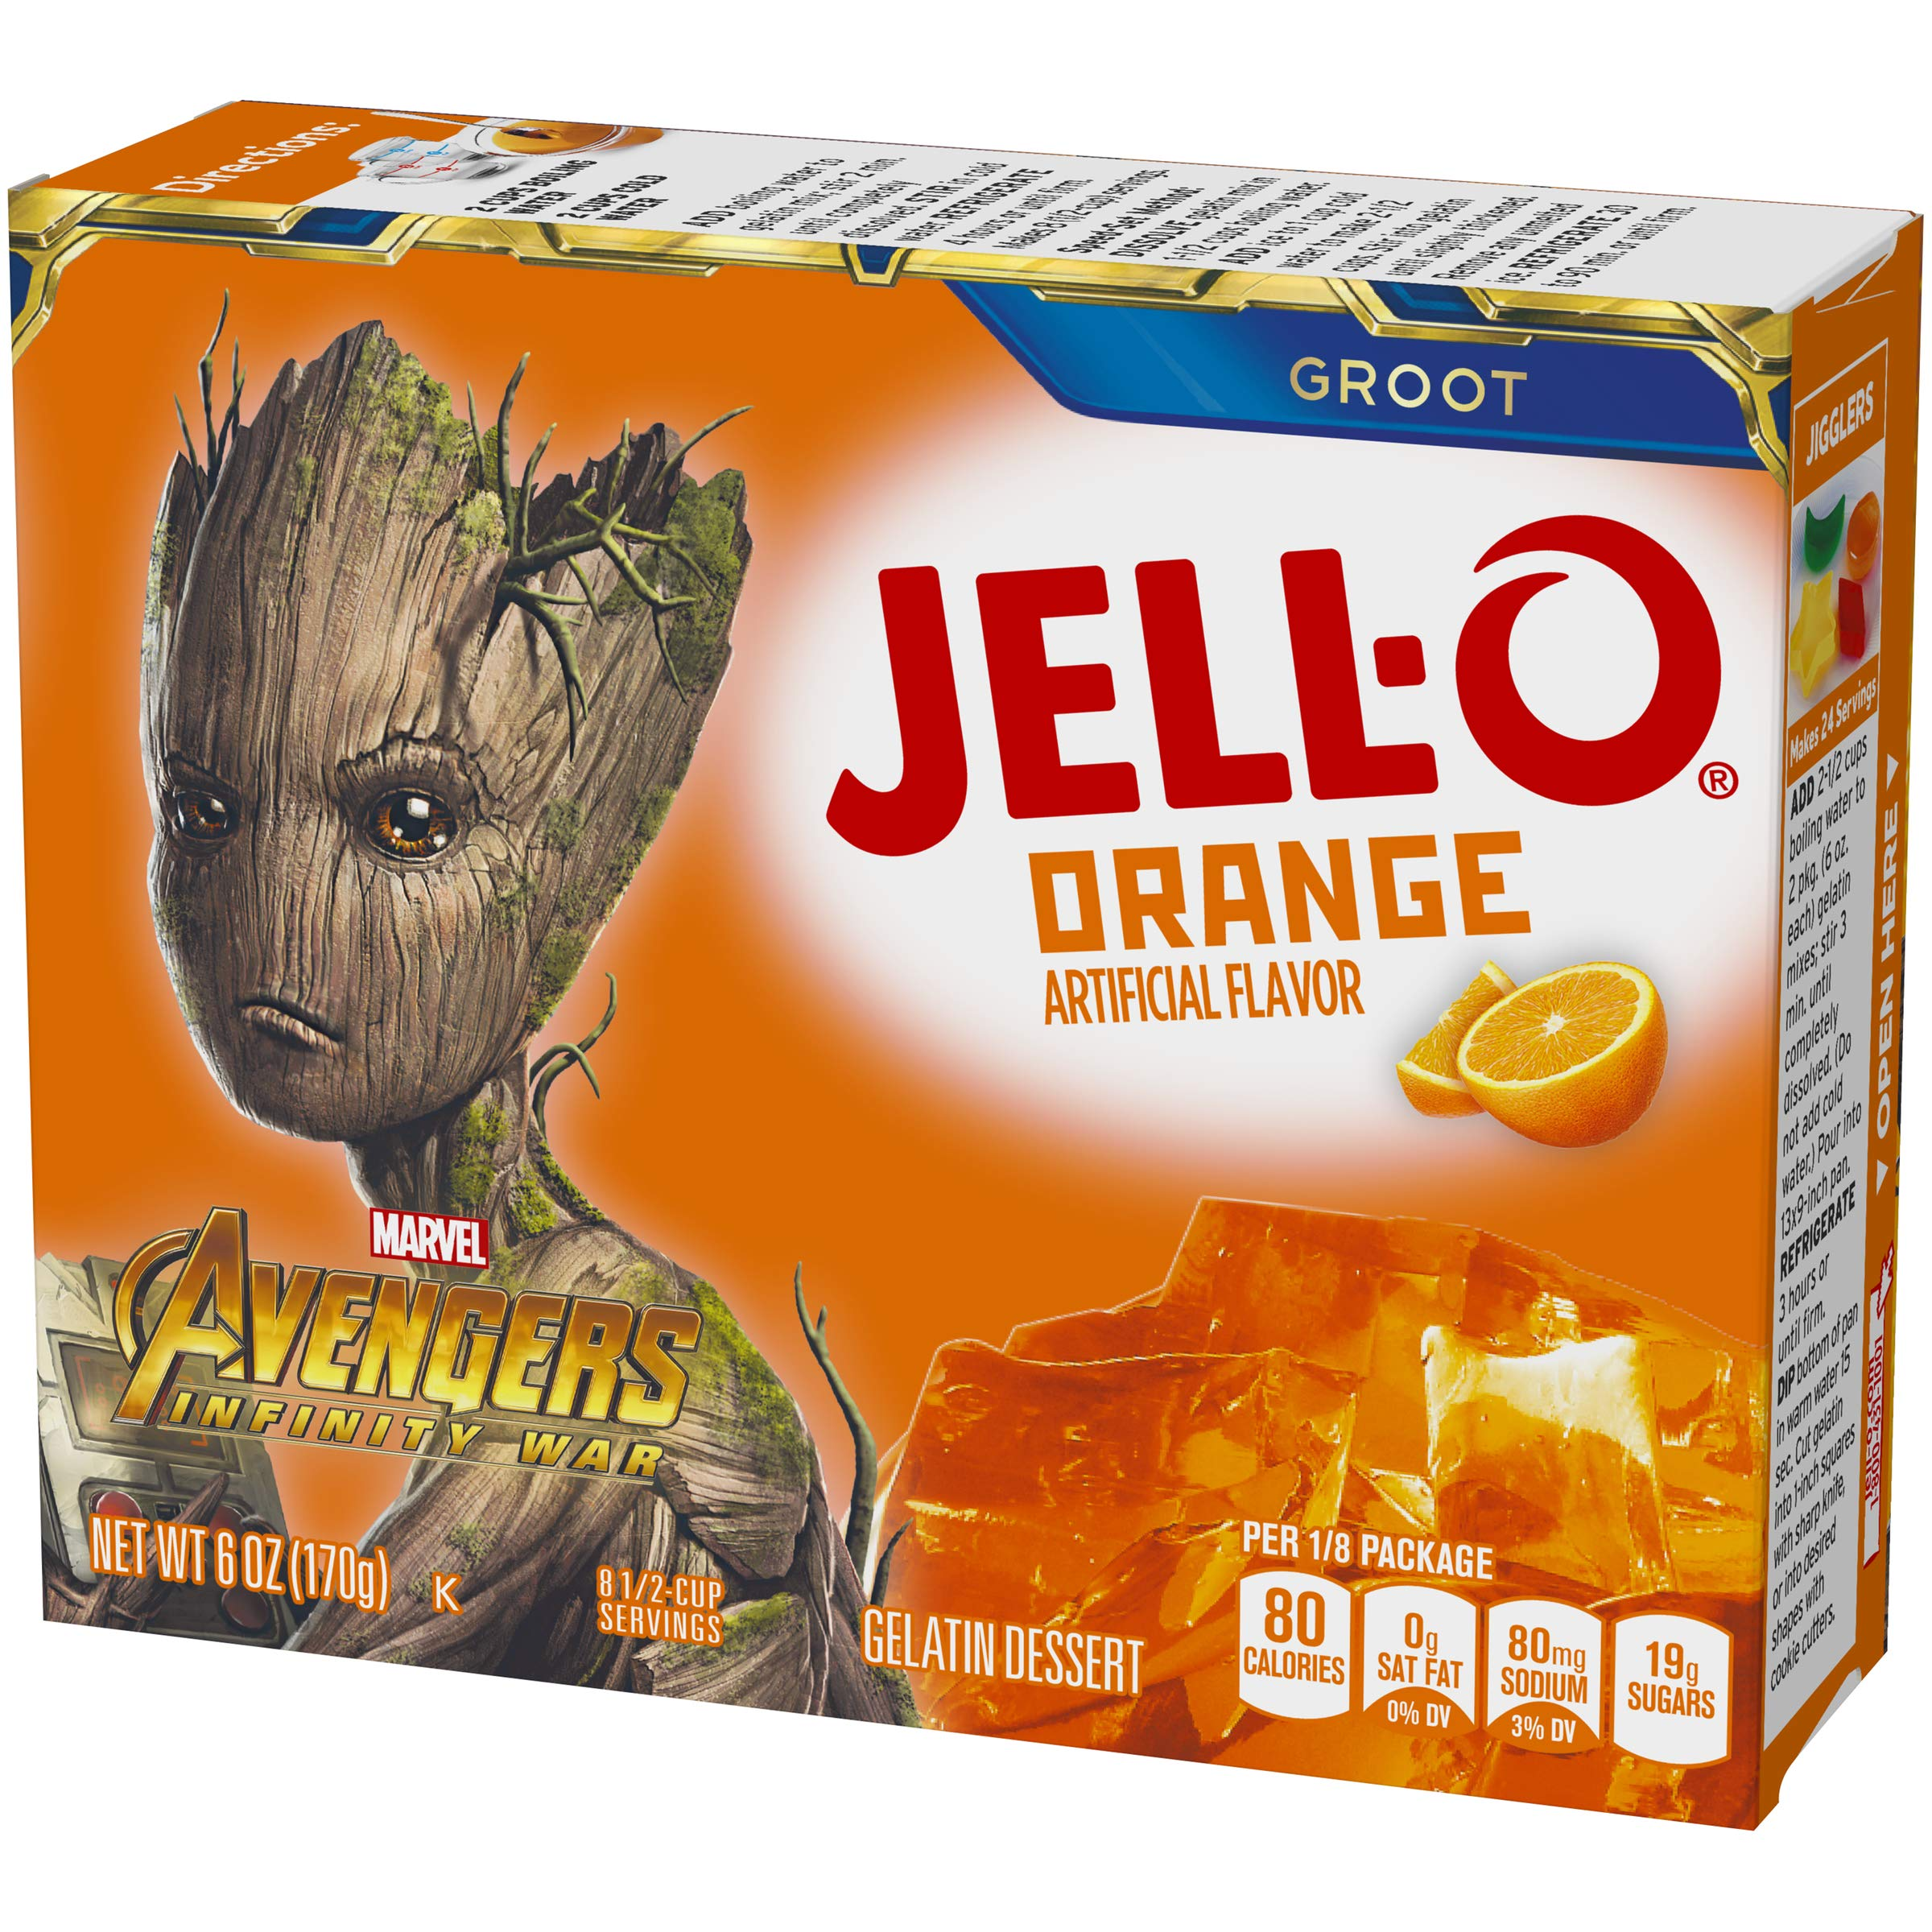 Jell-O Orange Gelatin Dessert Mix, 6 oz Box by Jell-O (Image #7)